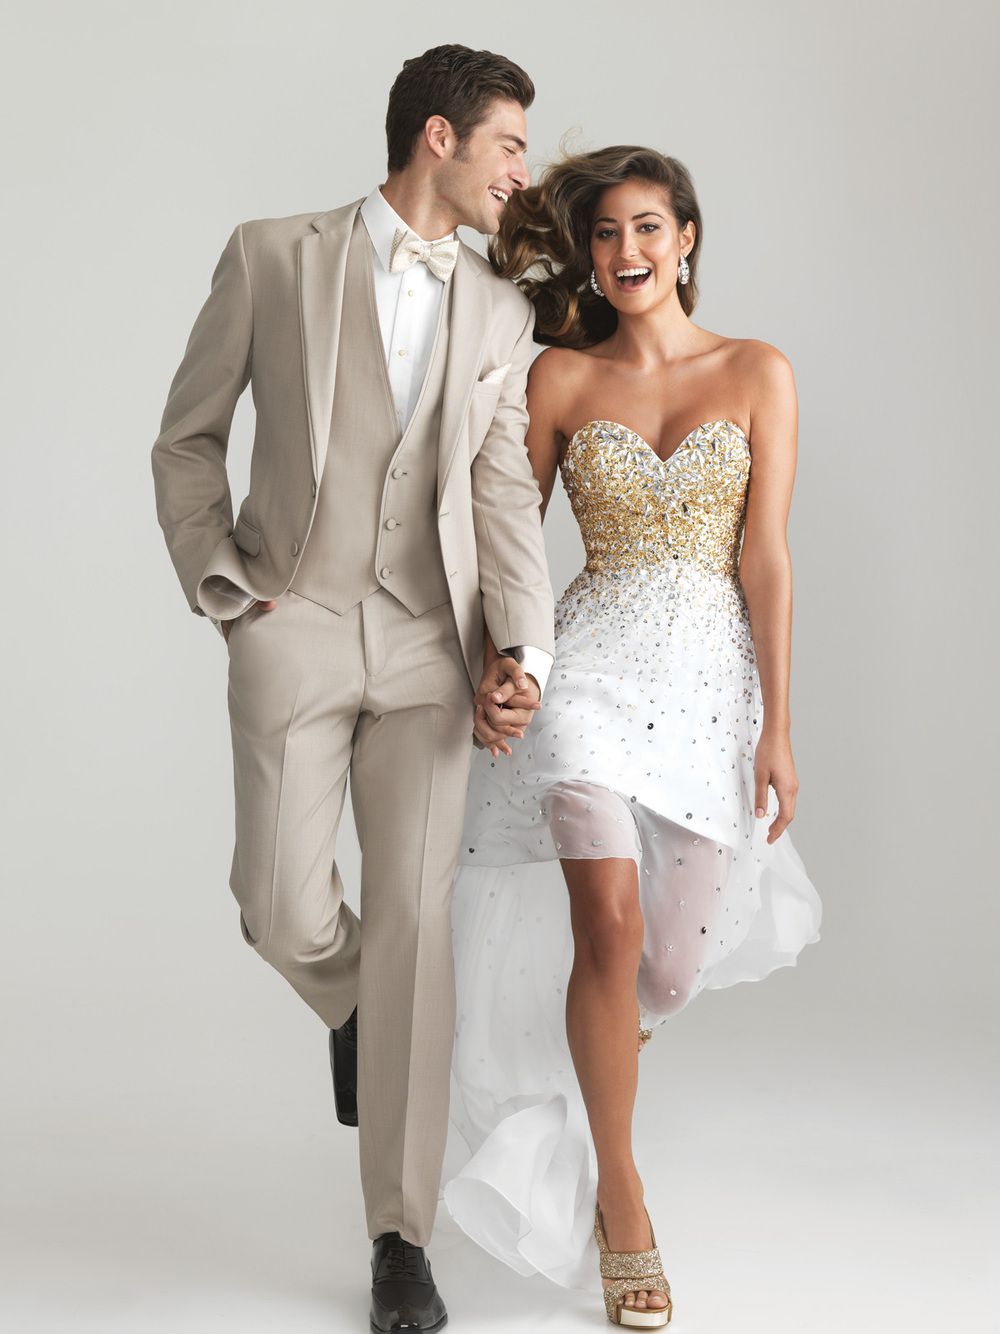 champagne gold tuxedo | Custom-made-Champagne-tuxedo-groom-wedding ...